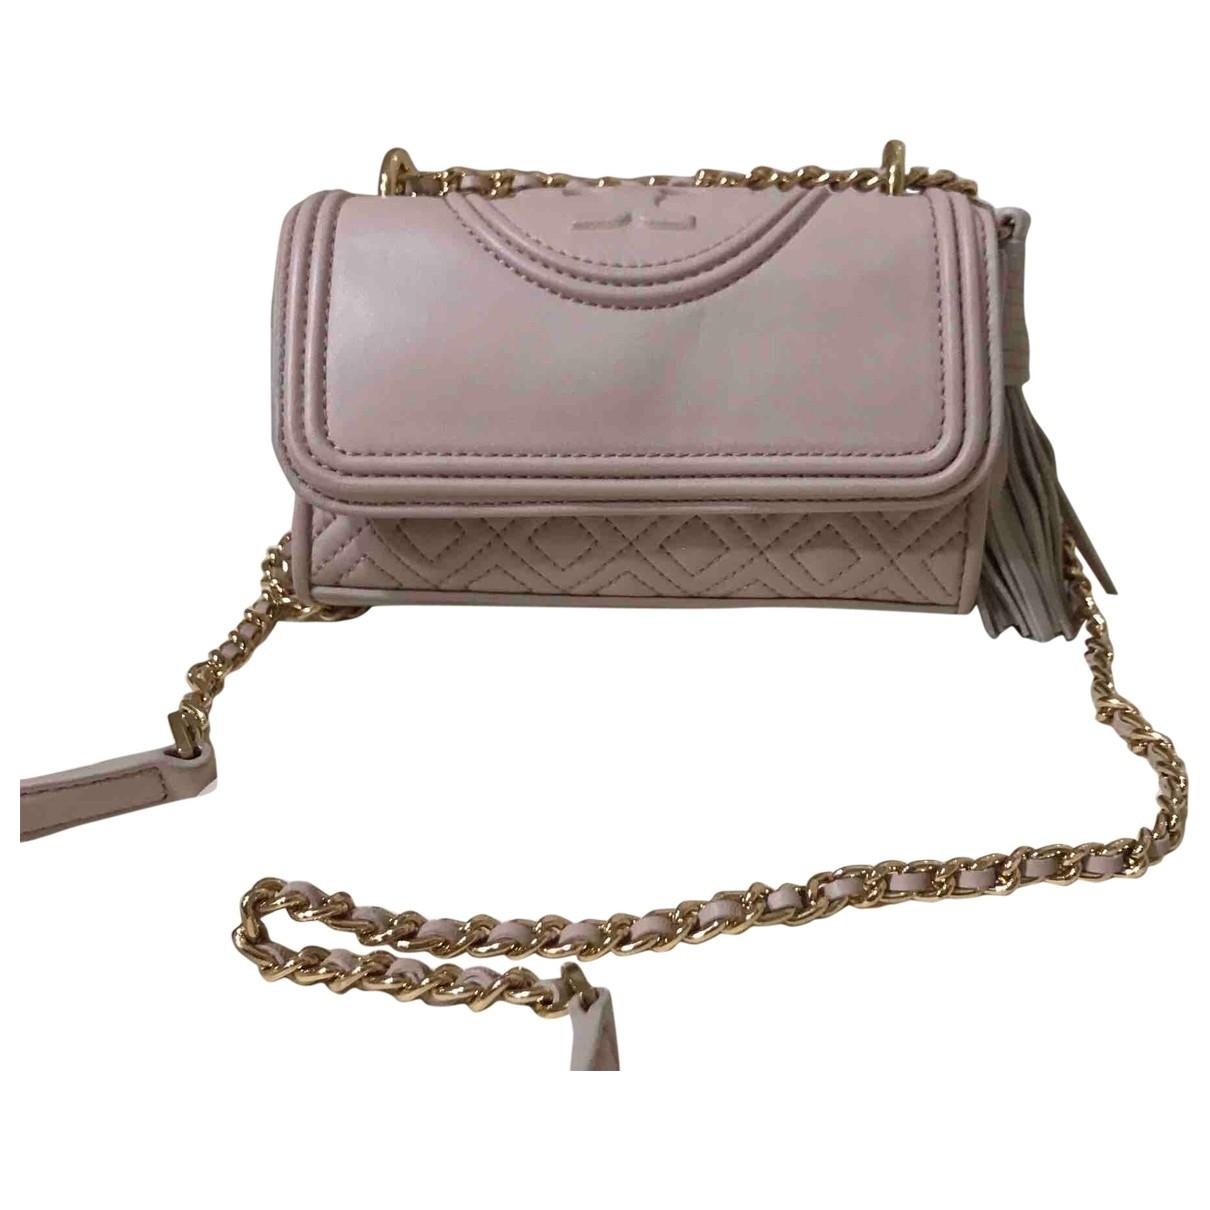 Tory Burch \N Leather Clutch bag for Women \N